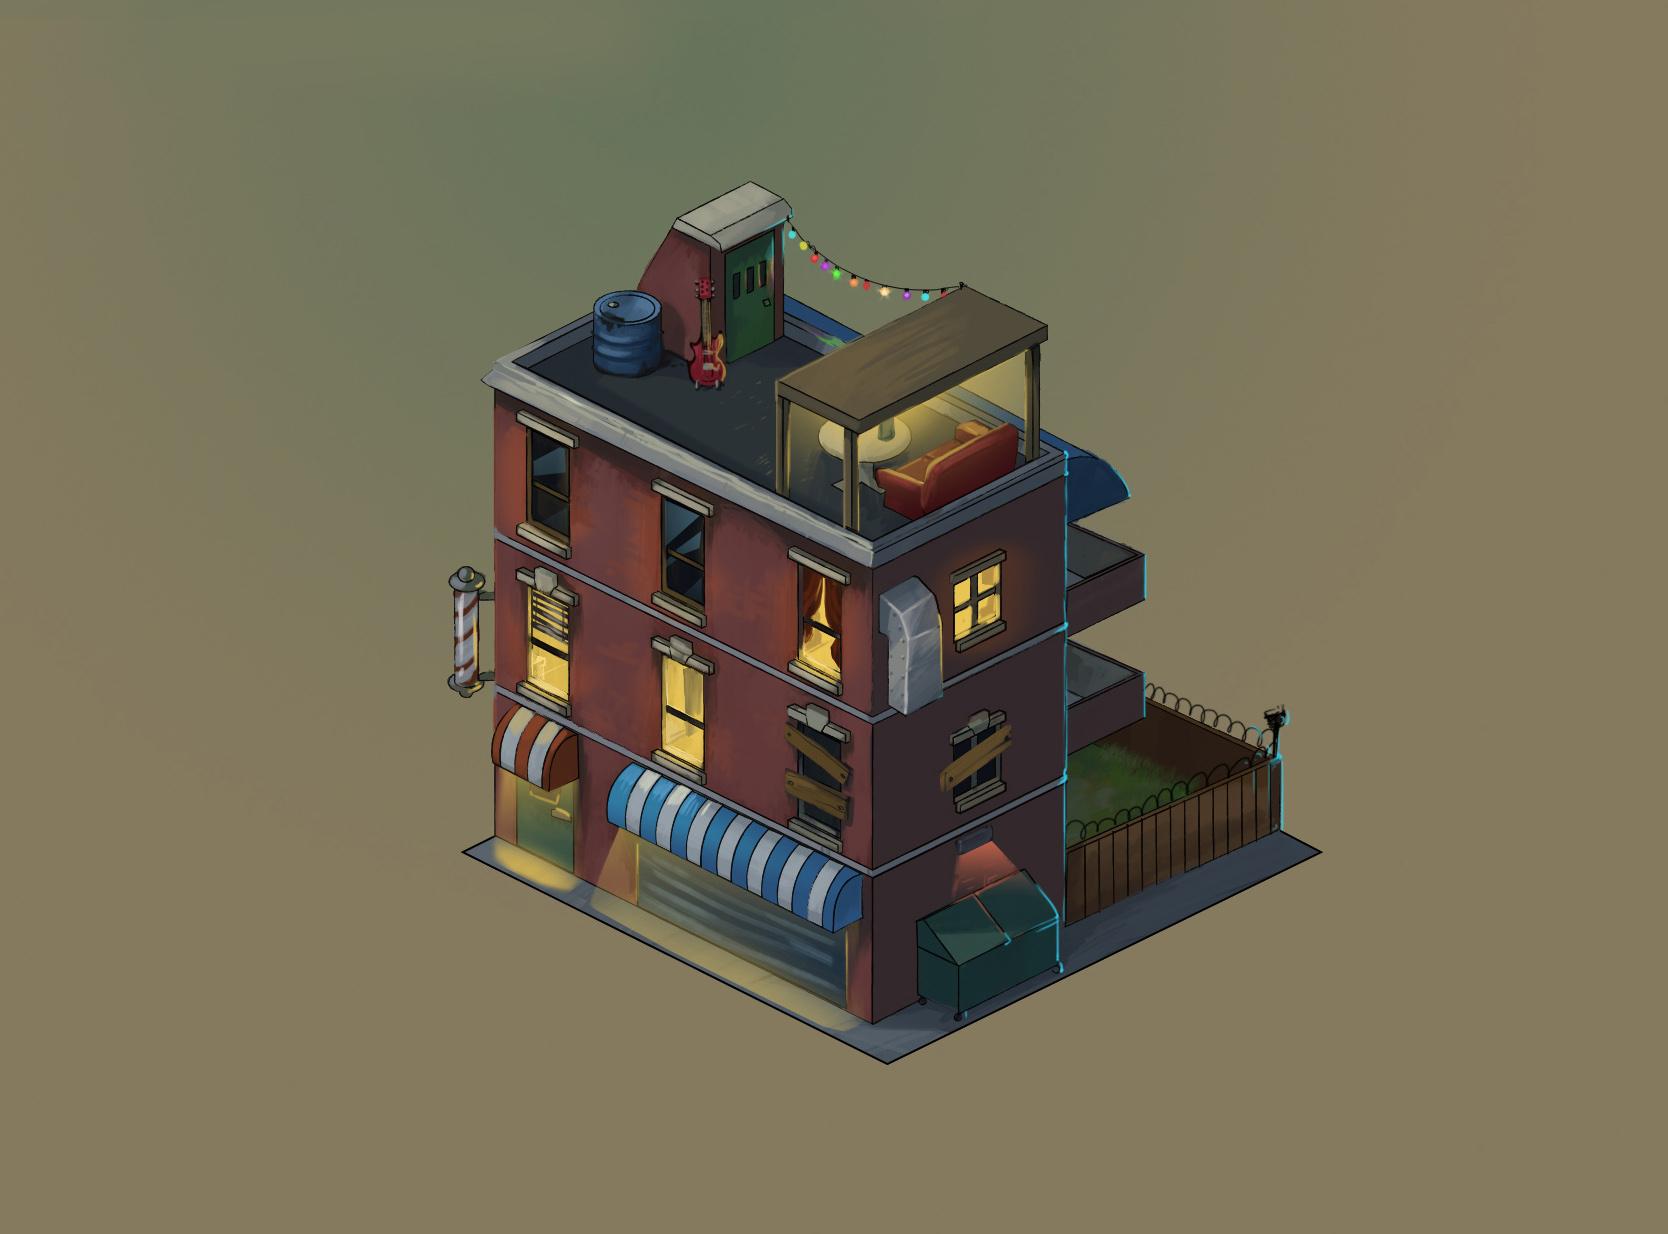 House_concept_2.jpg